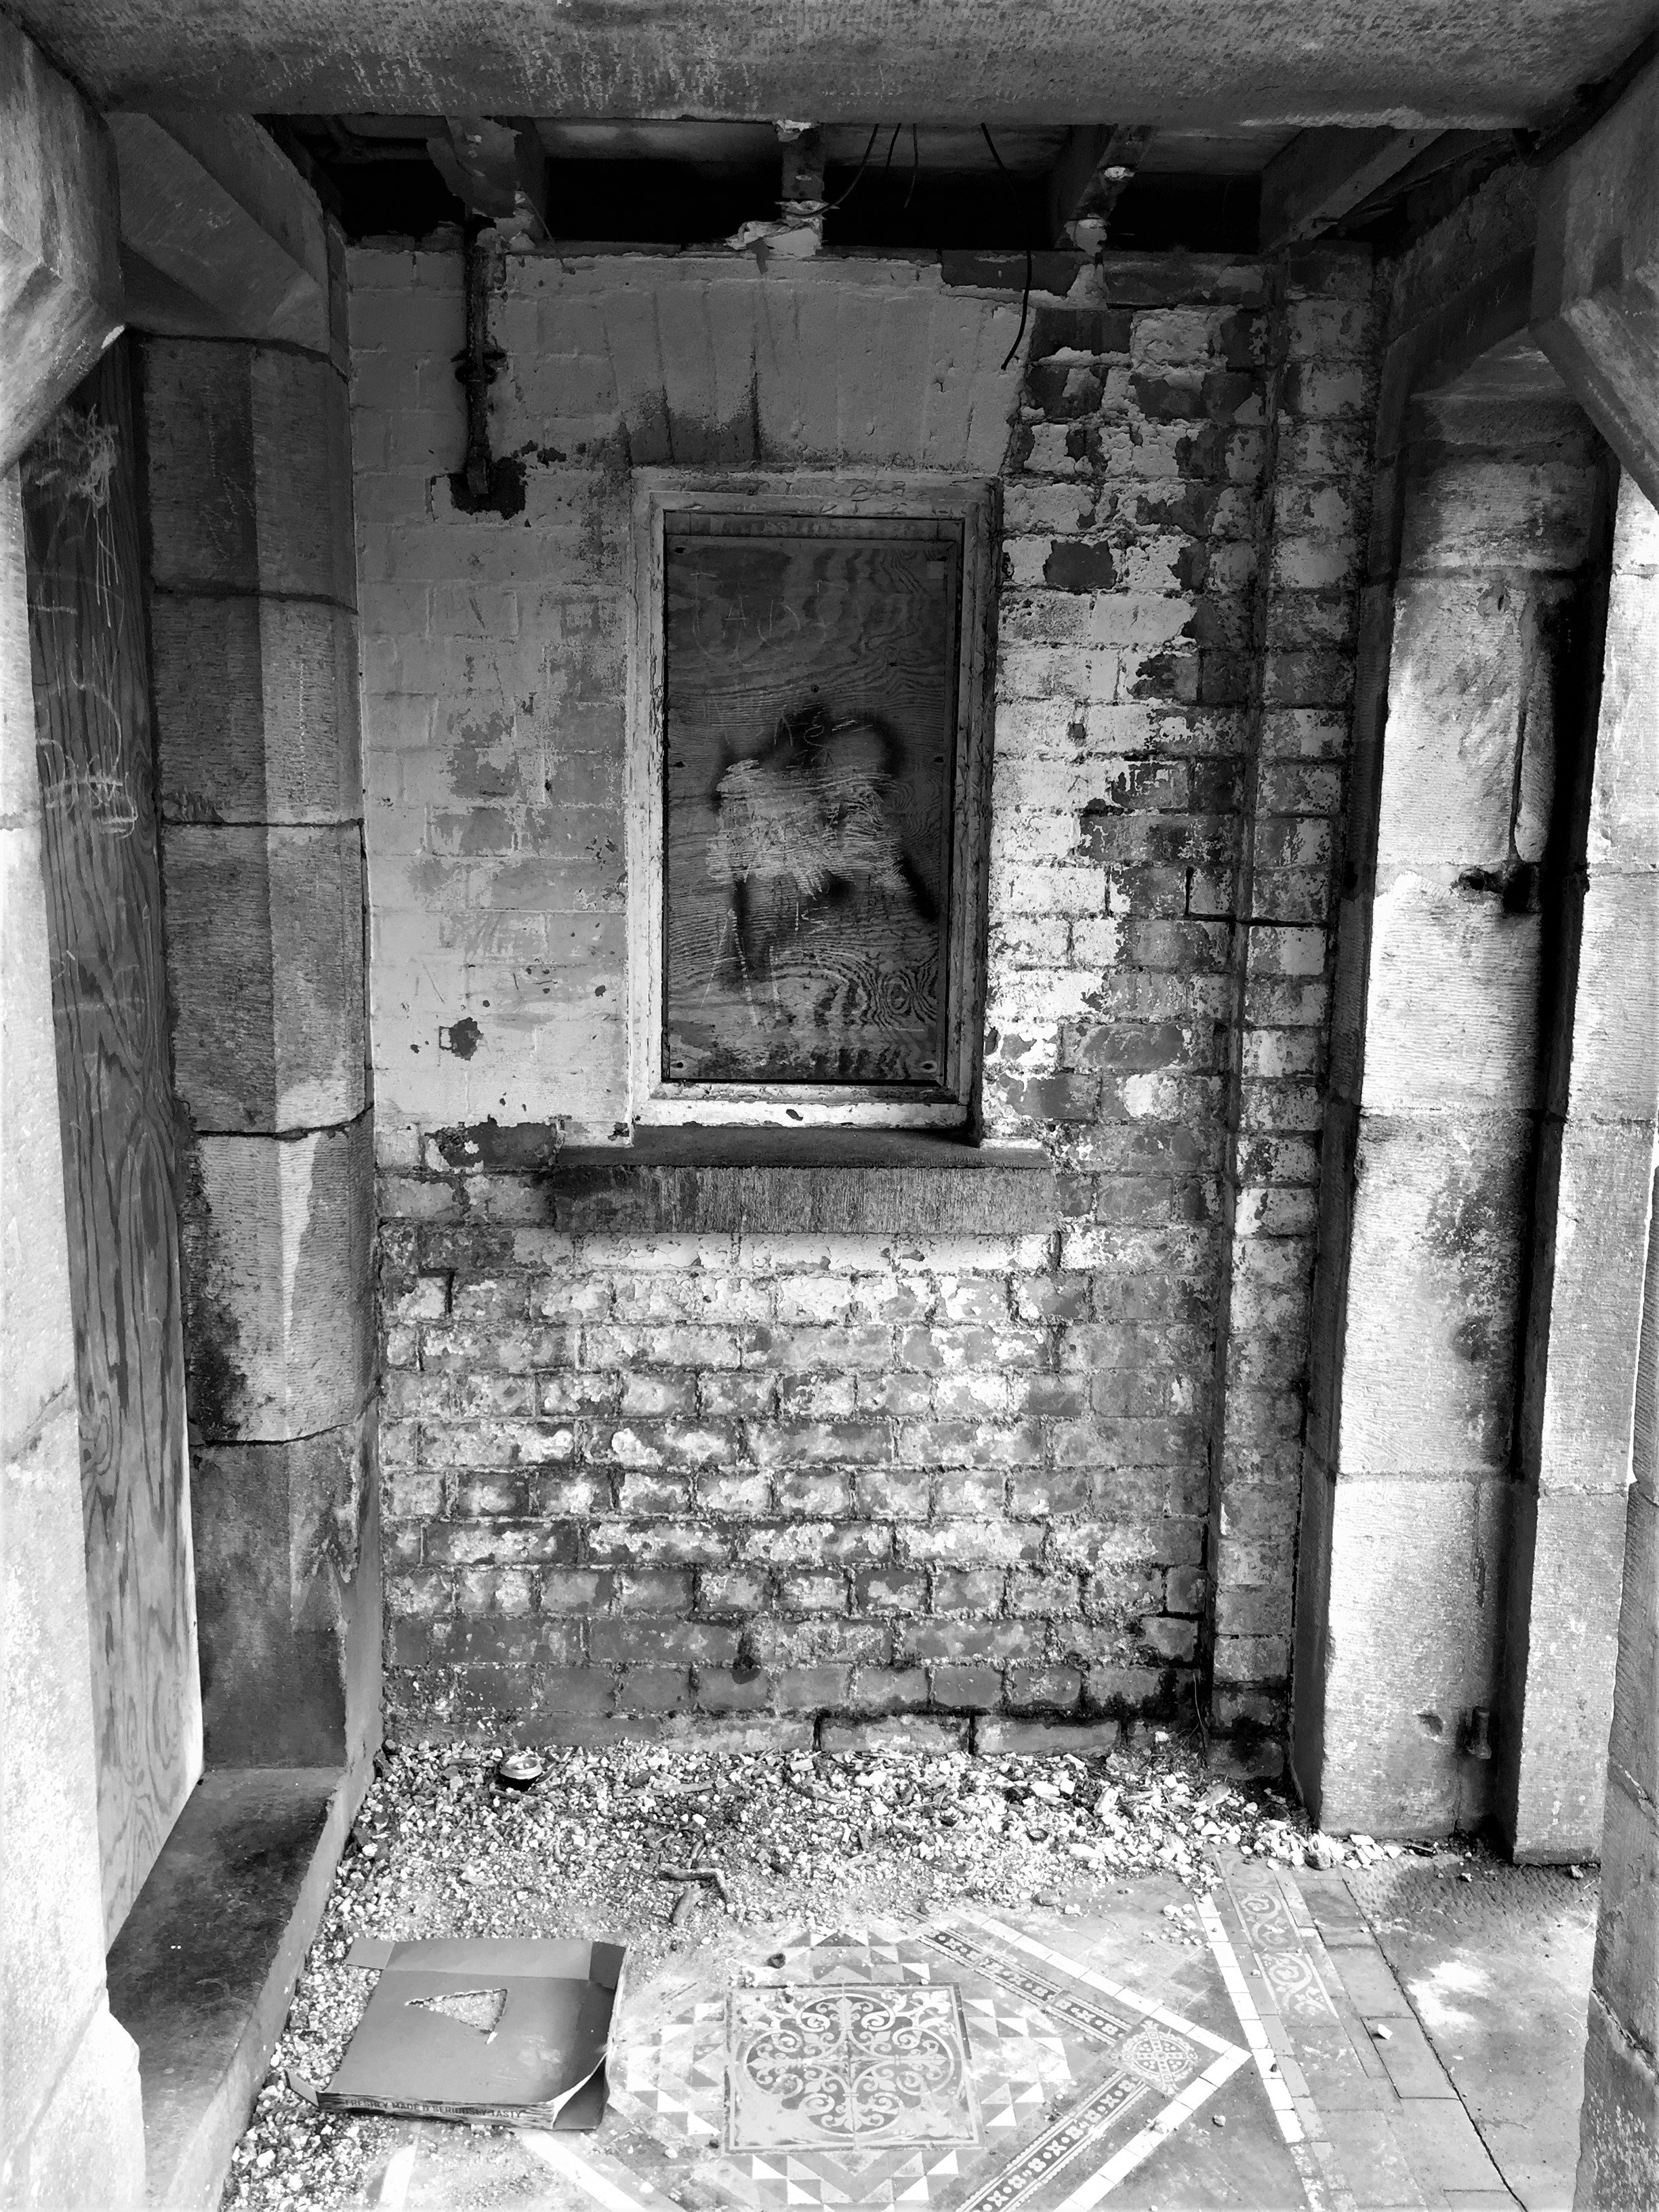 1-West Facing Gate Lodge Doorway of St Finan's Hospital Killarney